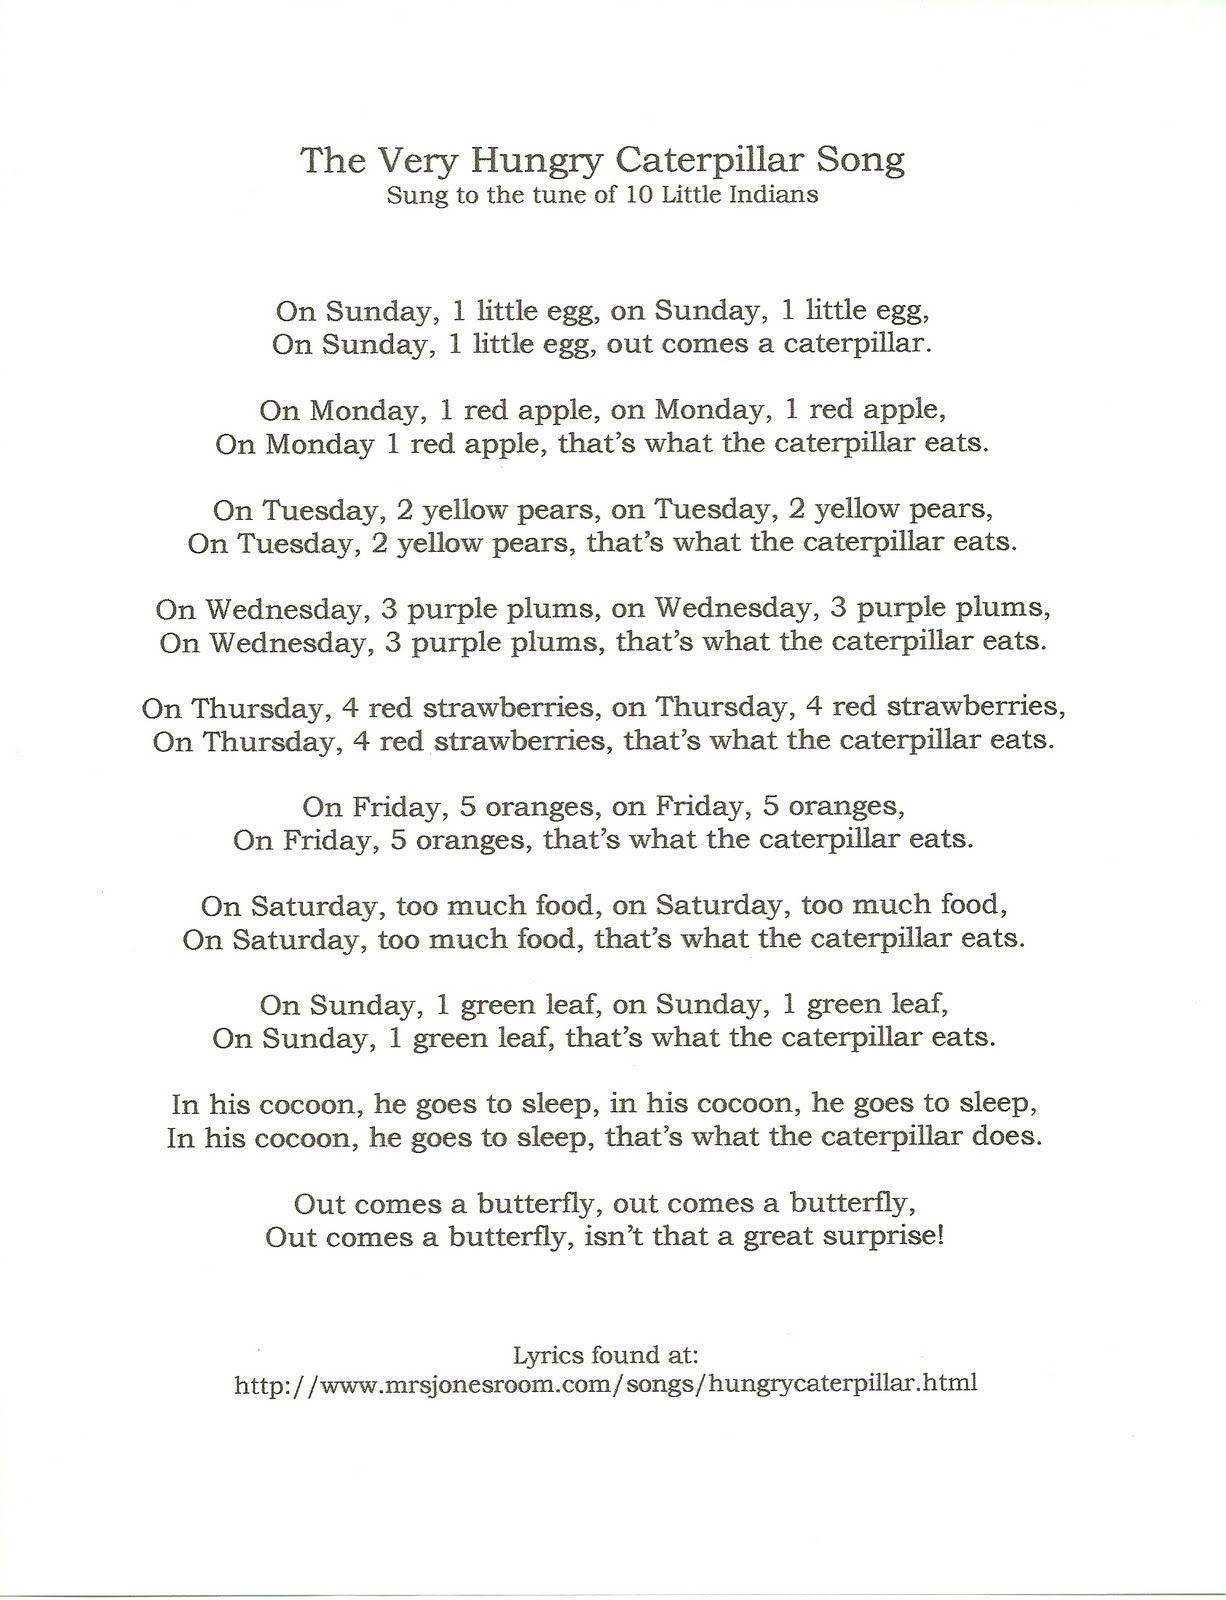 Movement/ Music - The very hungry caterpillar song children